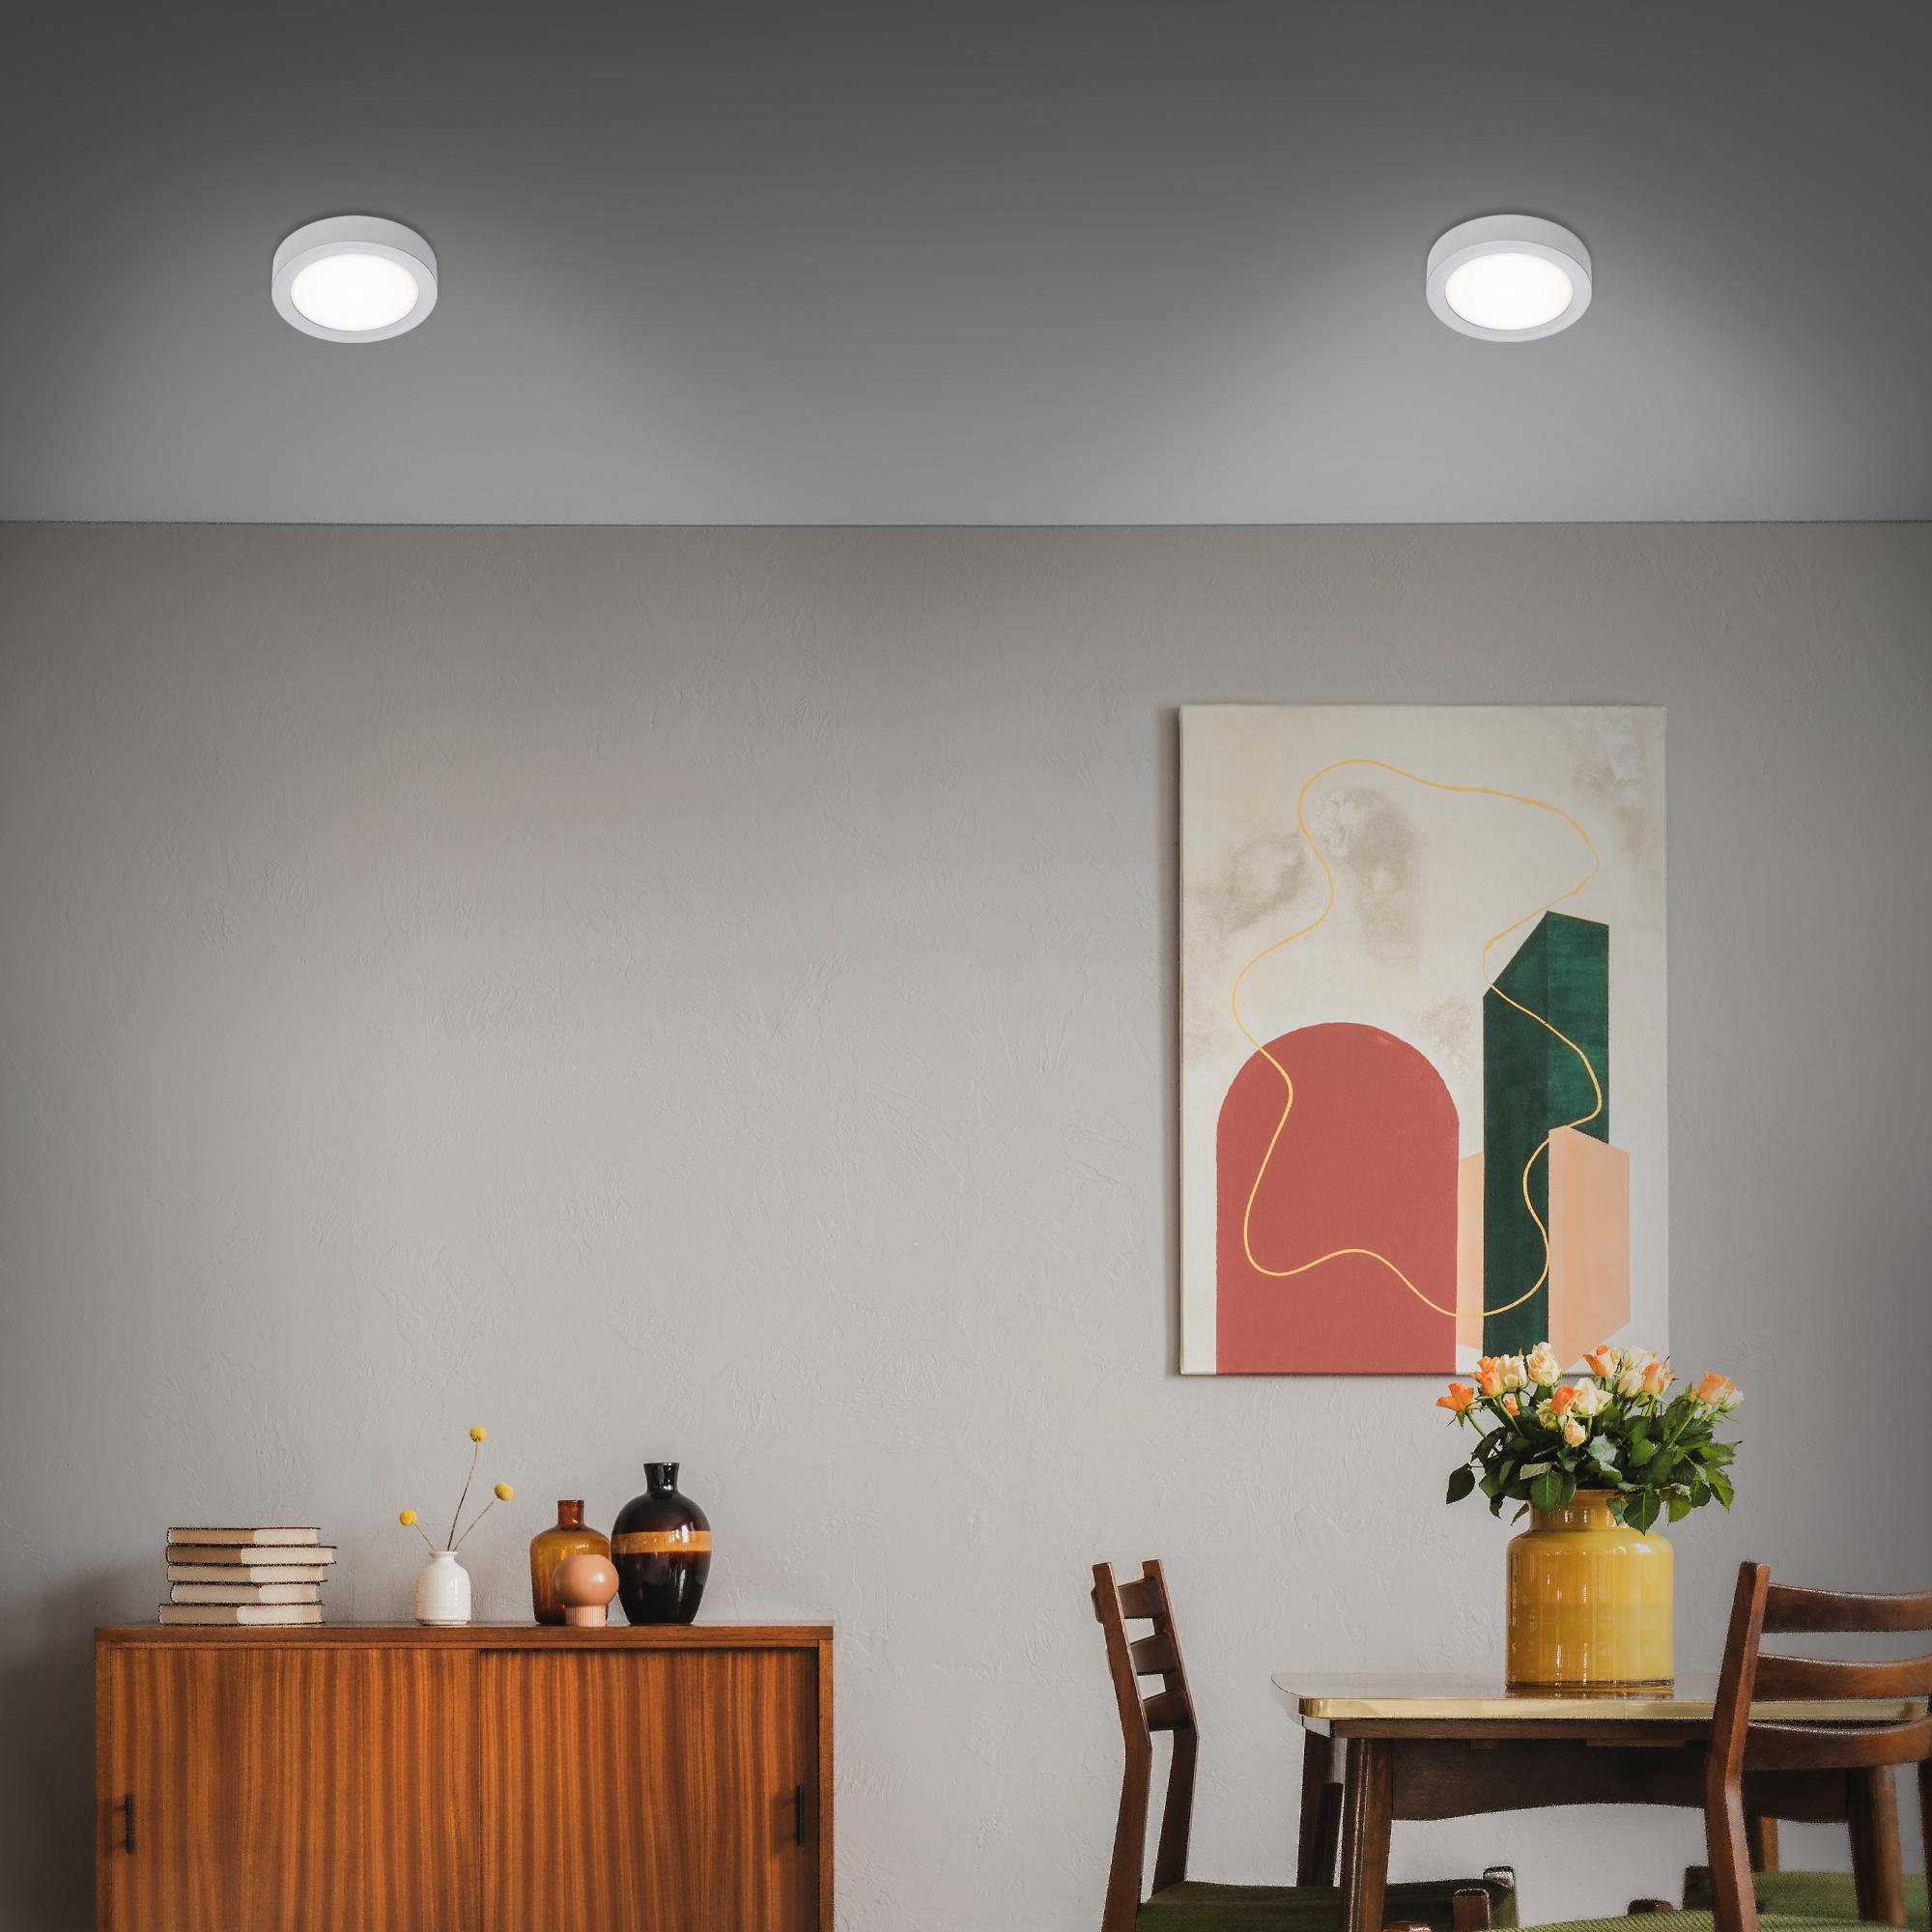 LED Deckenleuchte, Ø 17 cm, 12 W, Chrom-Matt